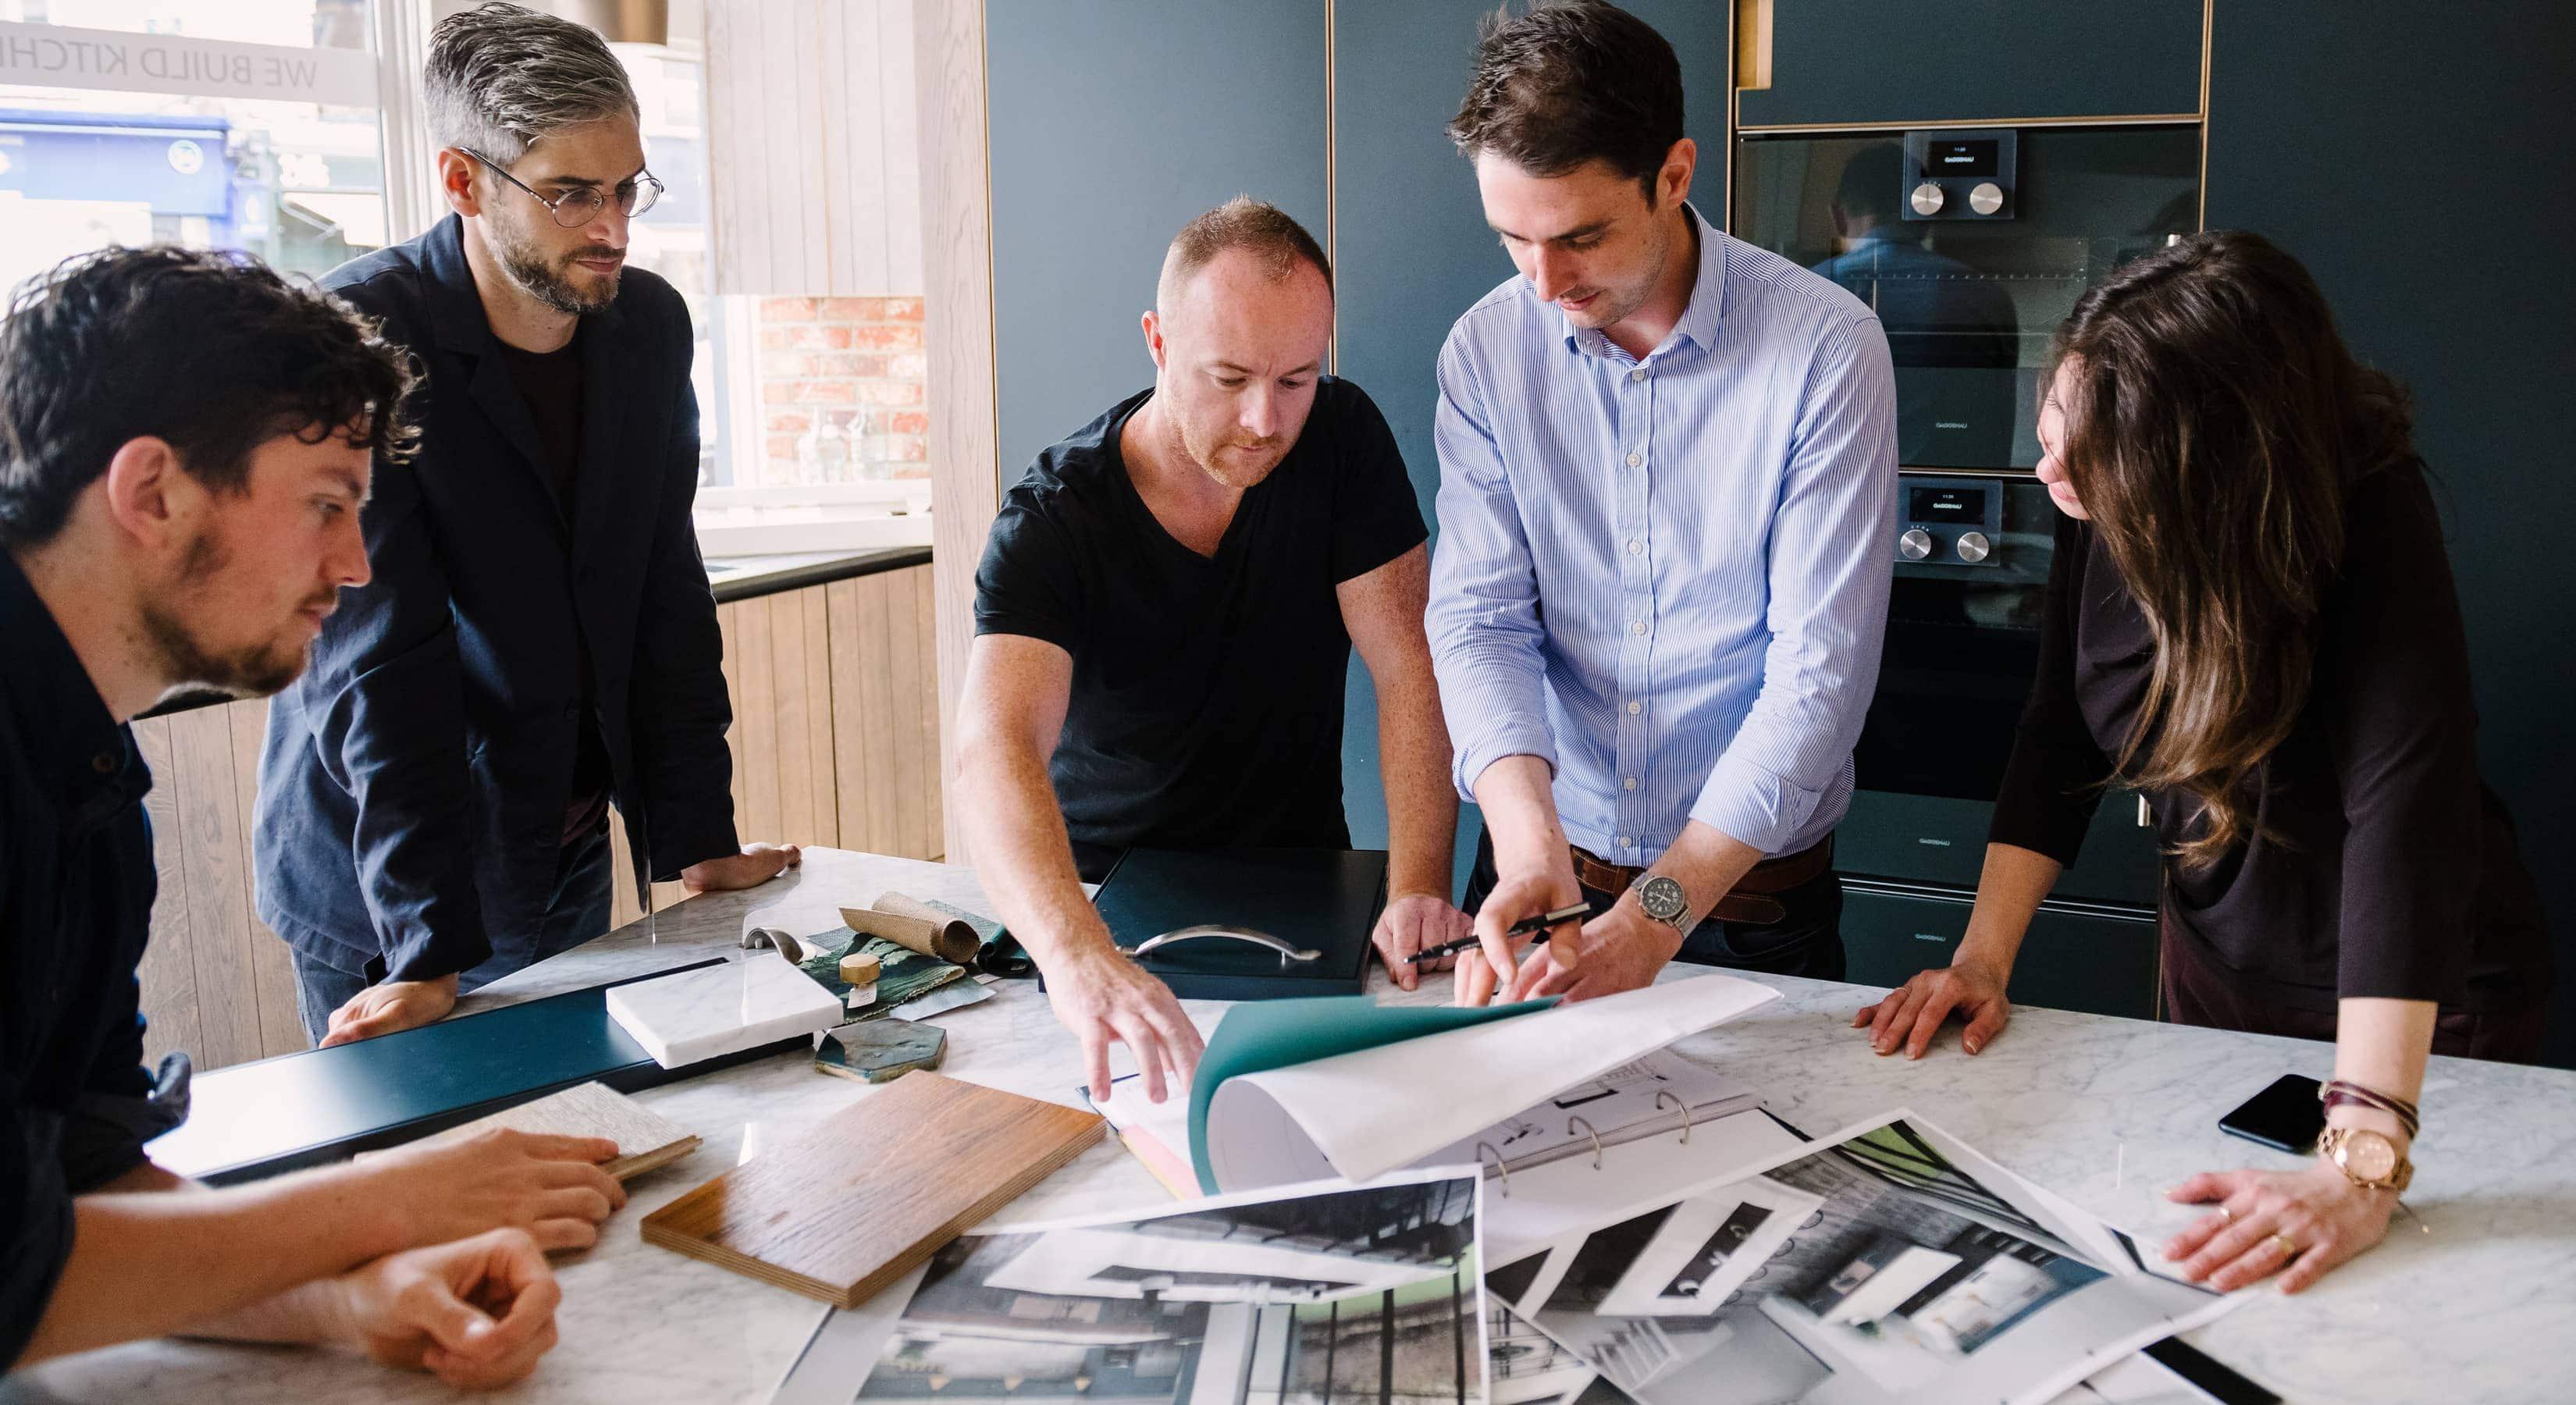 Team choosing materials for a kitchen design